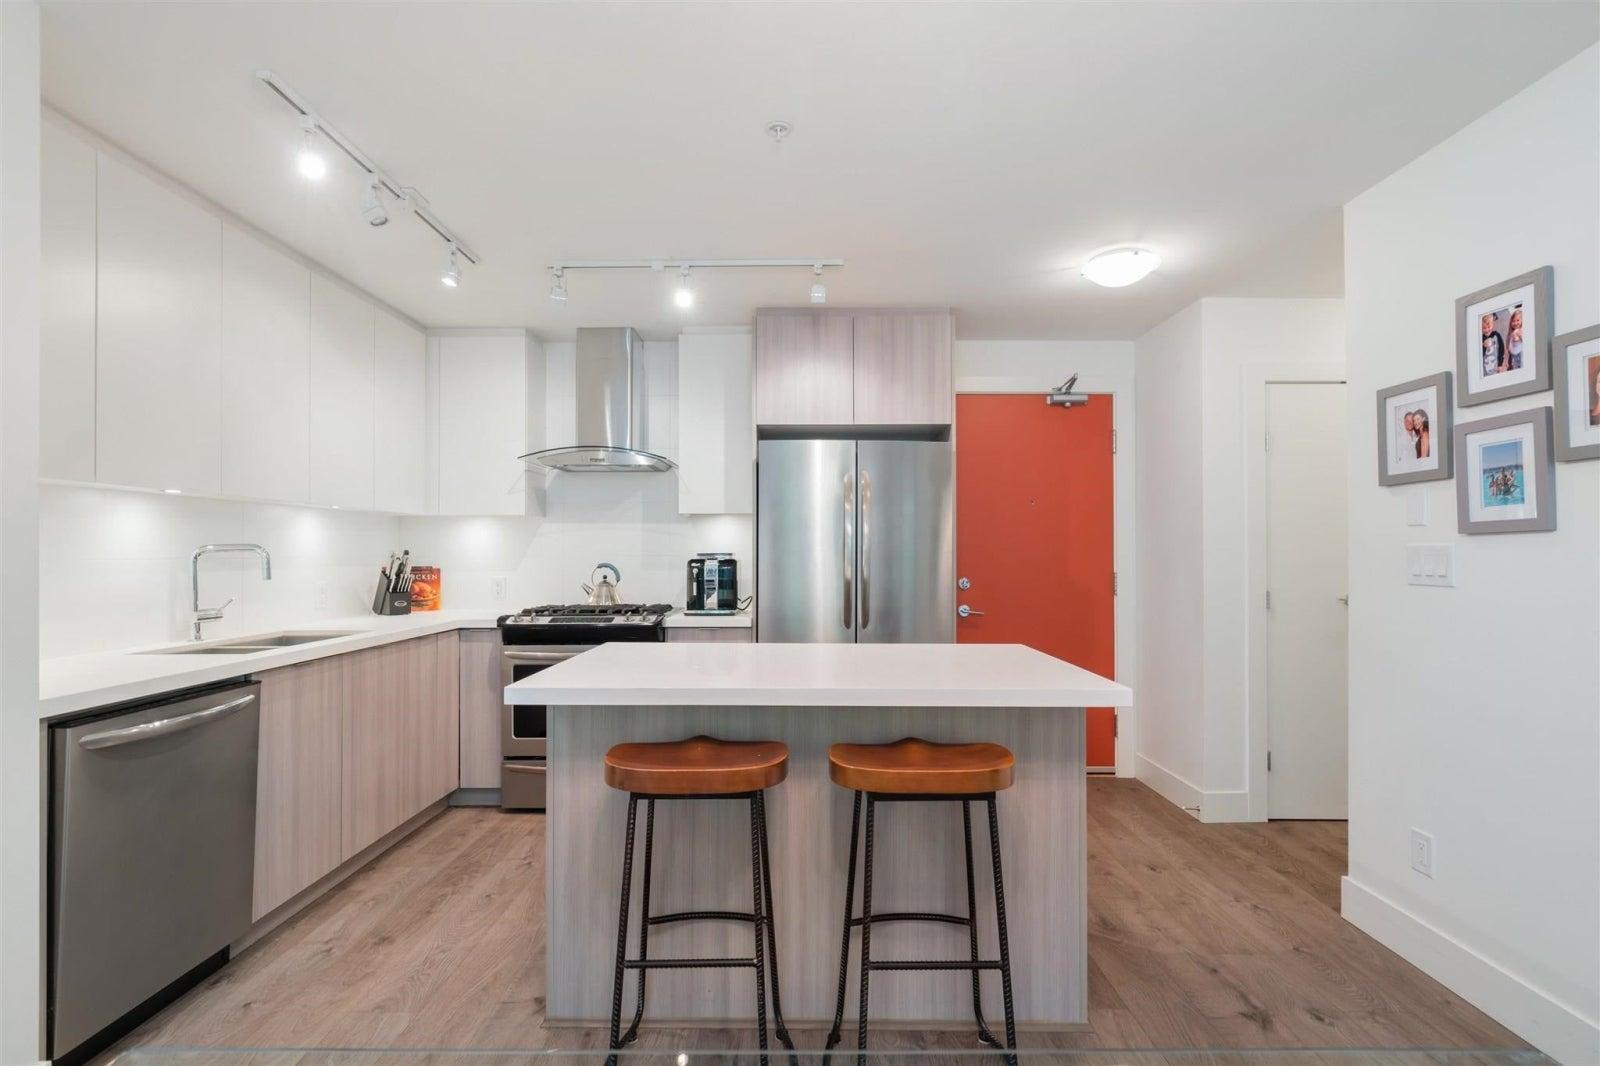 222 3602 ALDERCREST DRIVE - Roche Point Apartment/Condo for sale, 2 Bedrooms (R2603975) #9